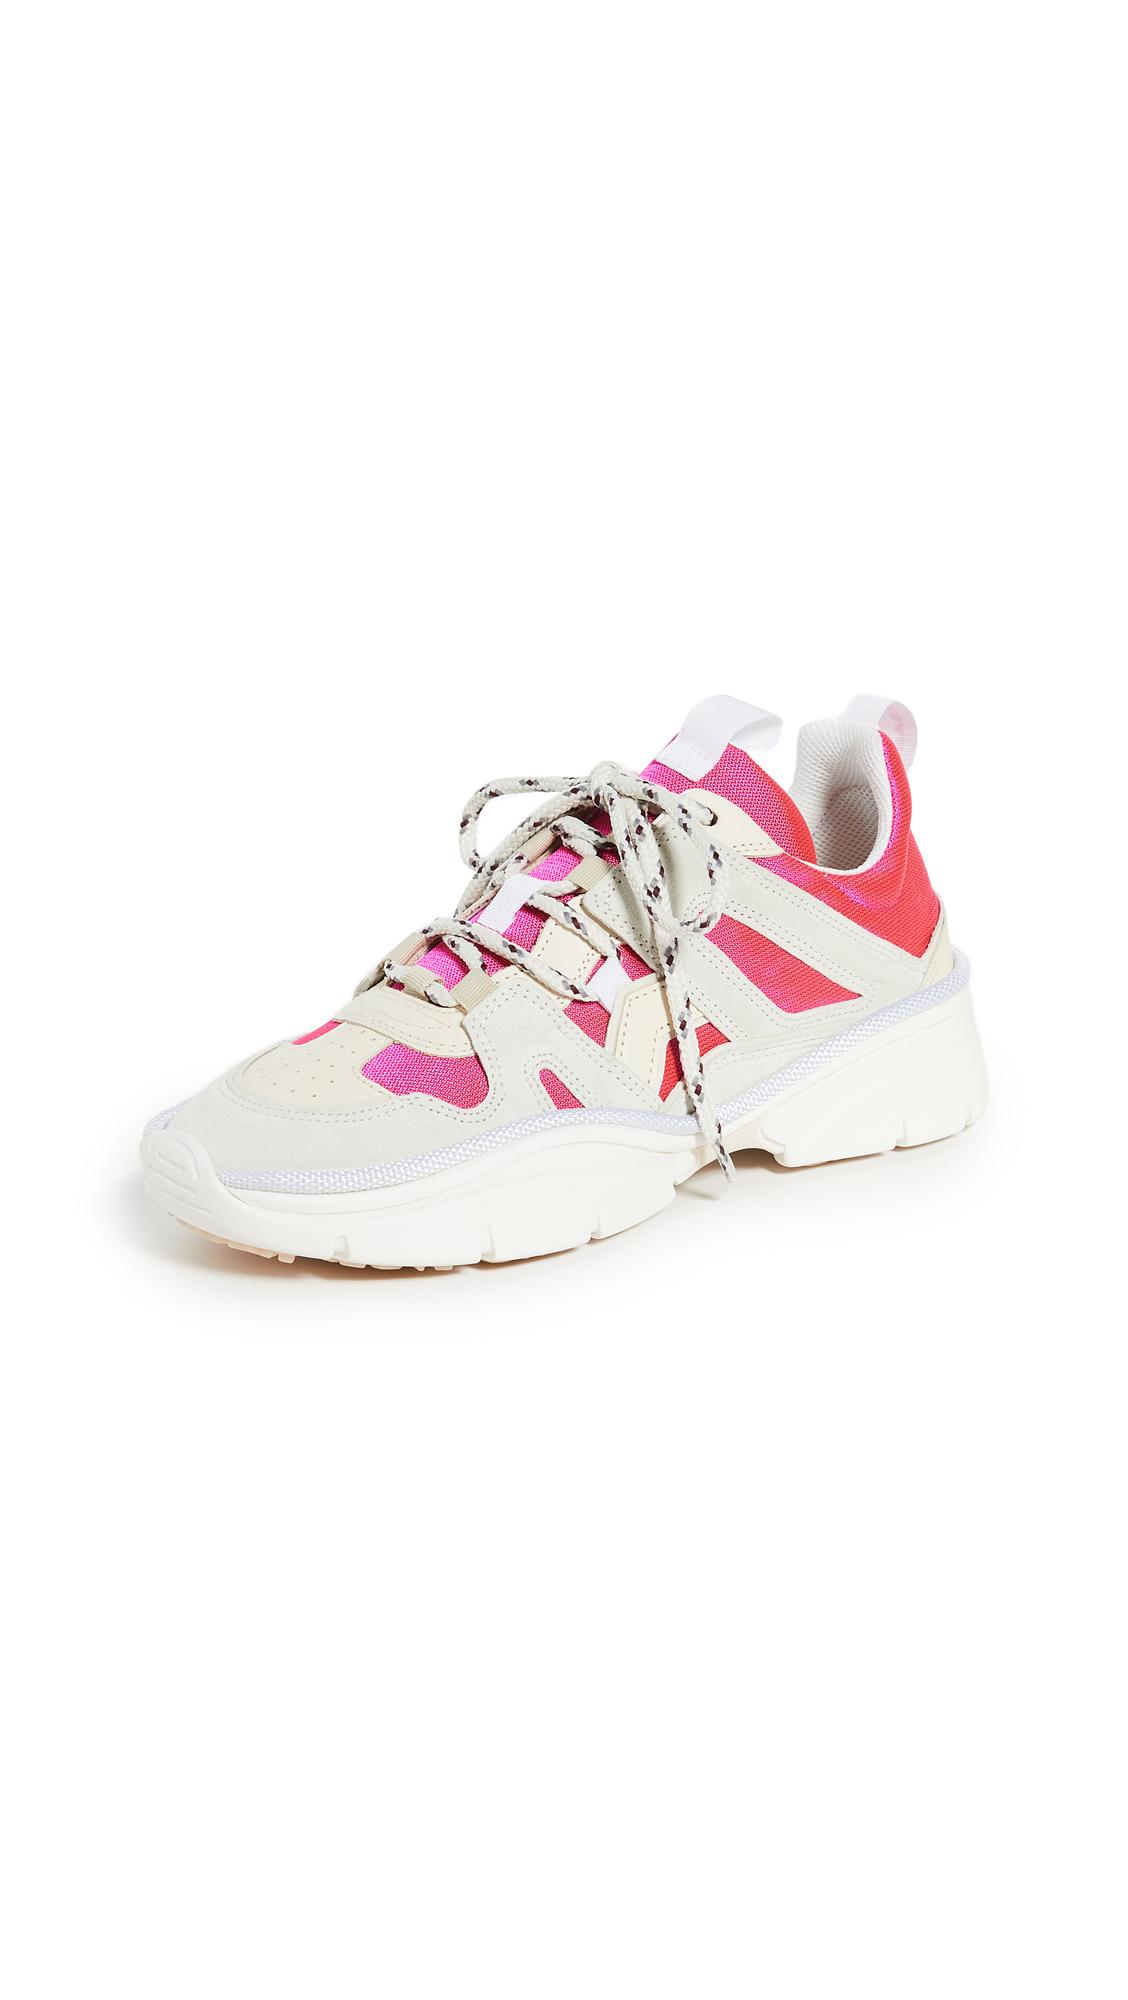 Isabel Marant Kindsay Sneakers - 50% Off Sale